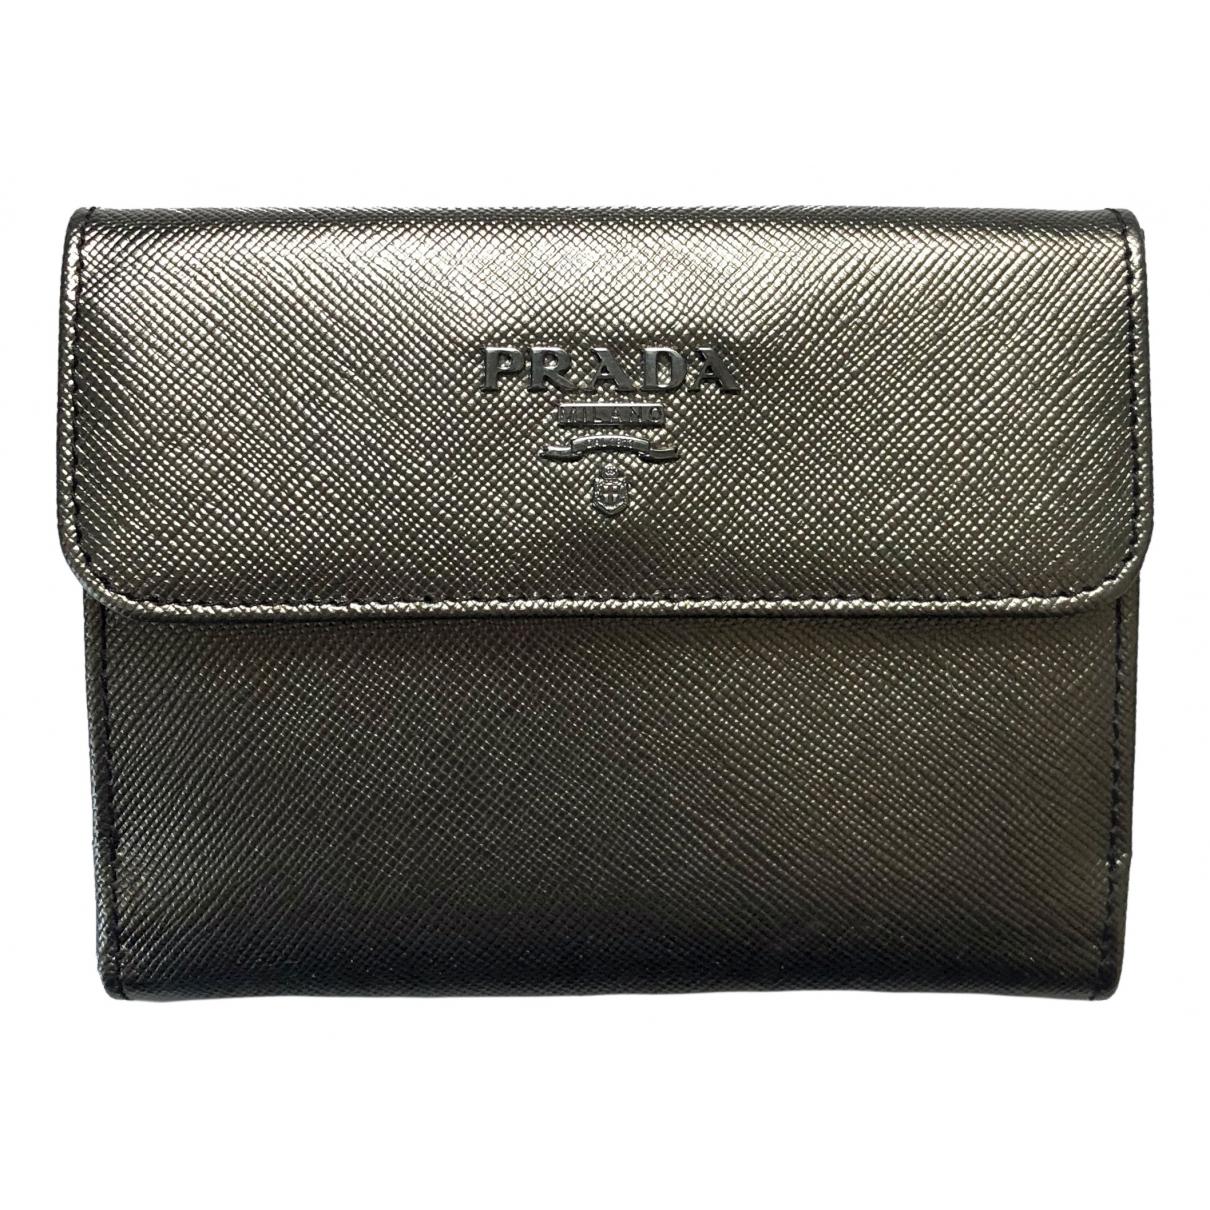 Prada Tessuto  Black Leather wallet for Women \N